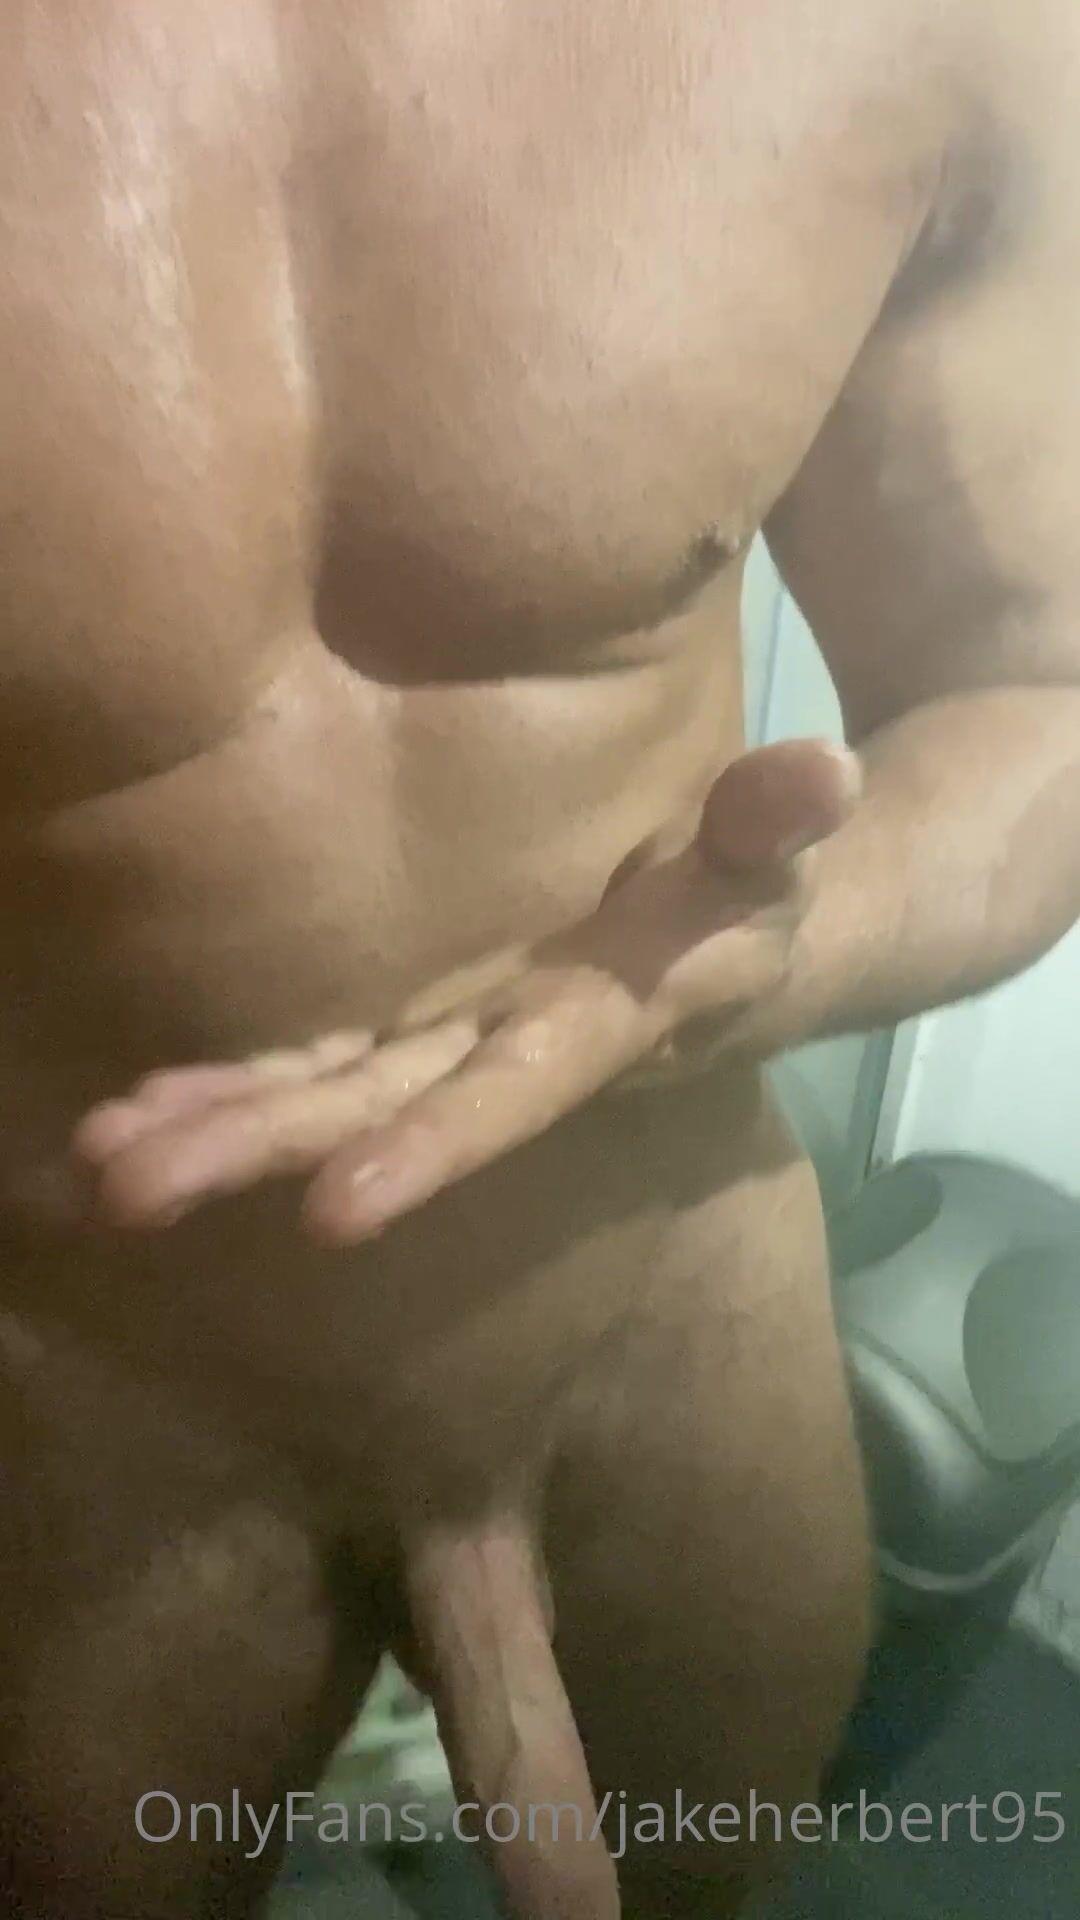 jakeherbert95 free porn videos (47)